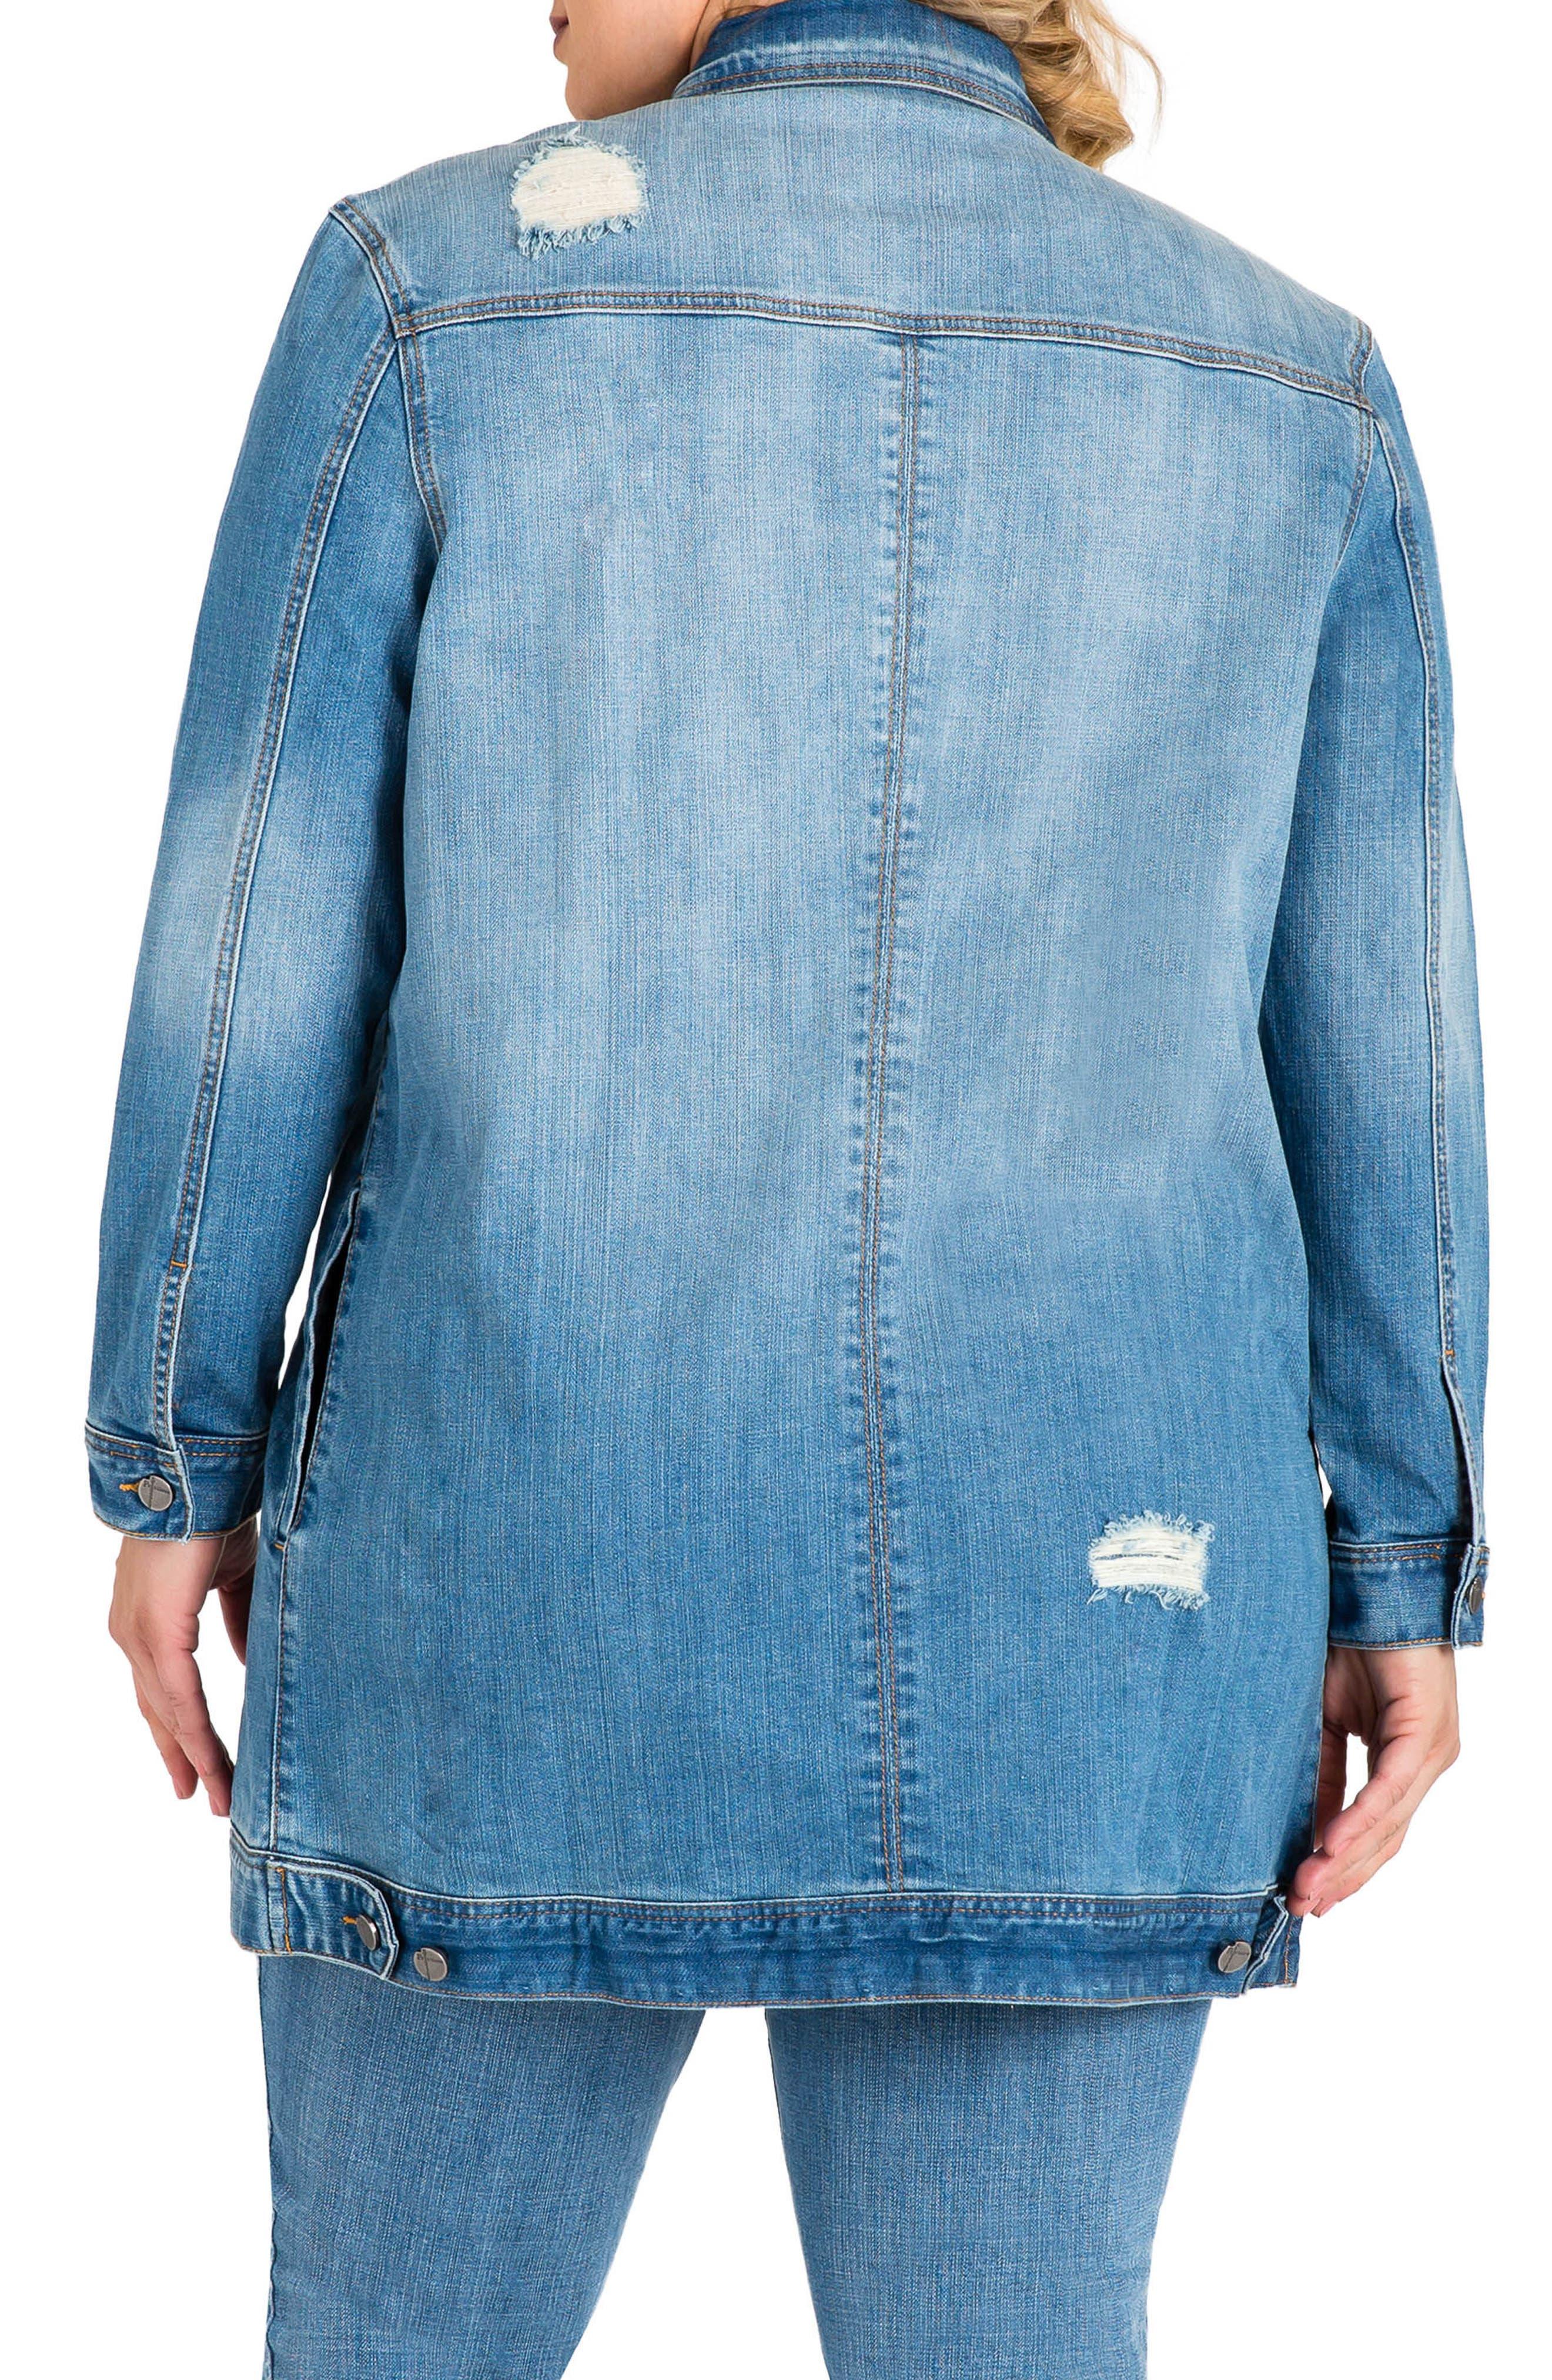 Margot Longline Denim Jacket,                             Alternate thumbnail 2, color,                             Light Blue